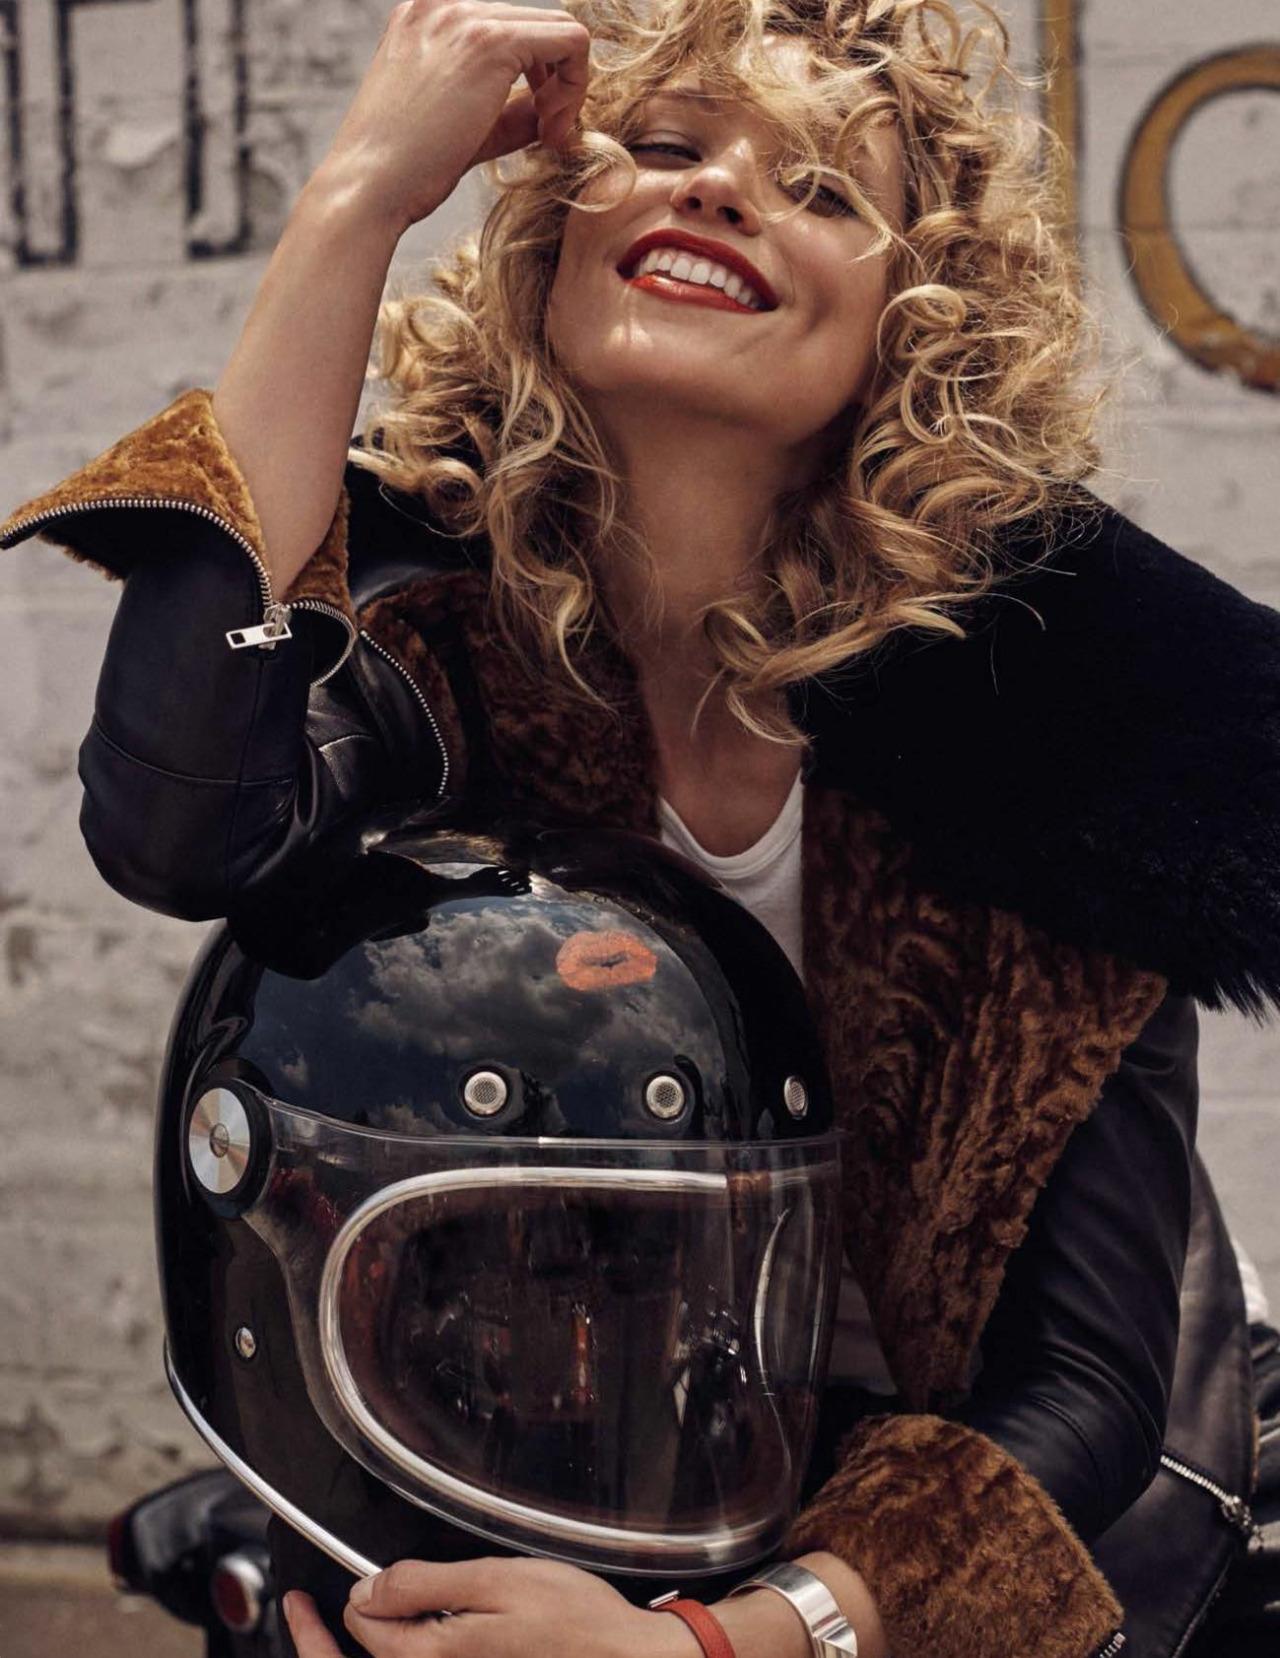 Hot Metal Vogue Spain September 2016 | Hana Jirickova by Benny Horne